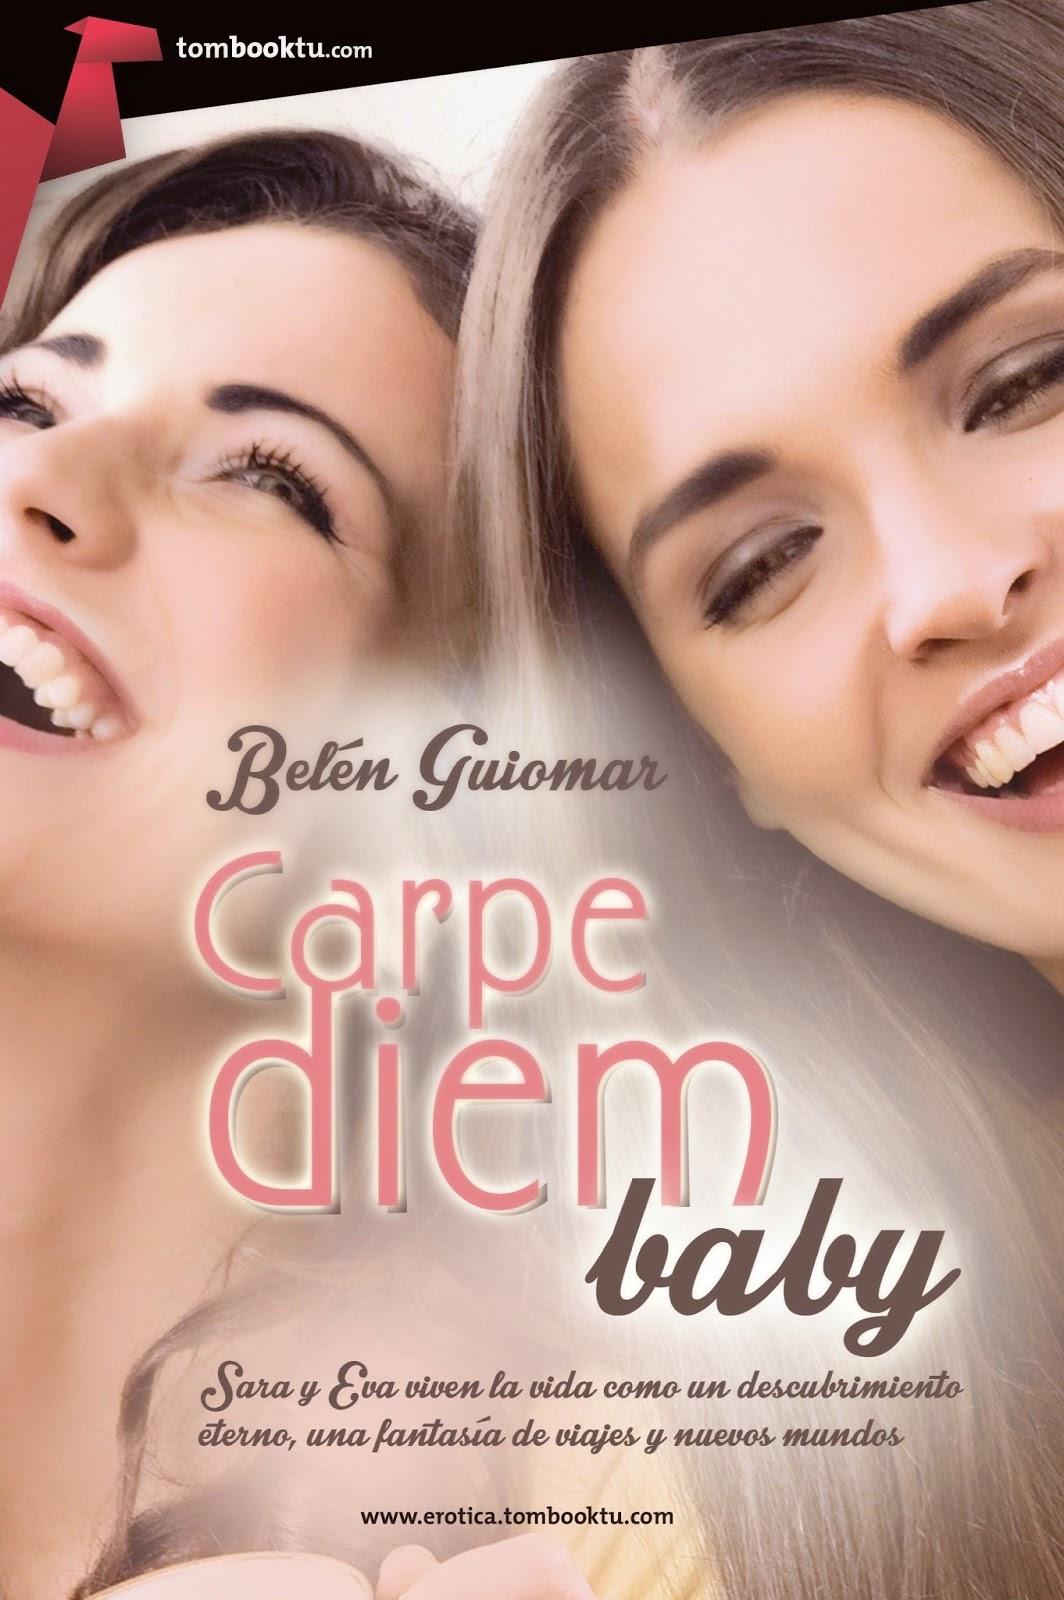 http://yerathelbooks.blogspot.com.es/2014/11/resena-libro-38-carpe-diem-baby-belen.html